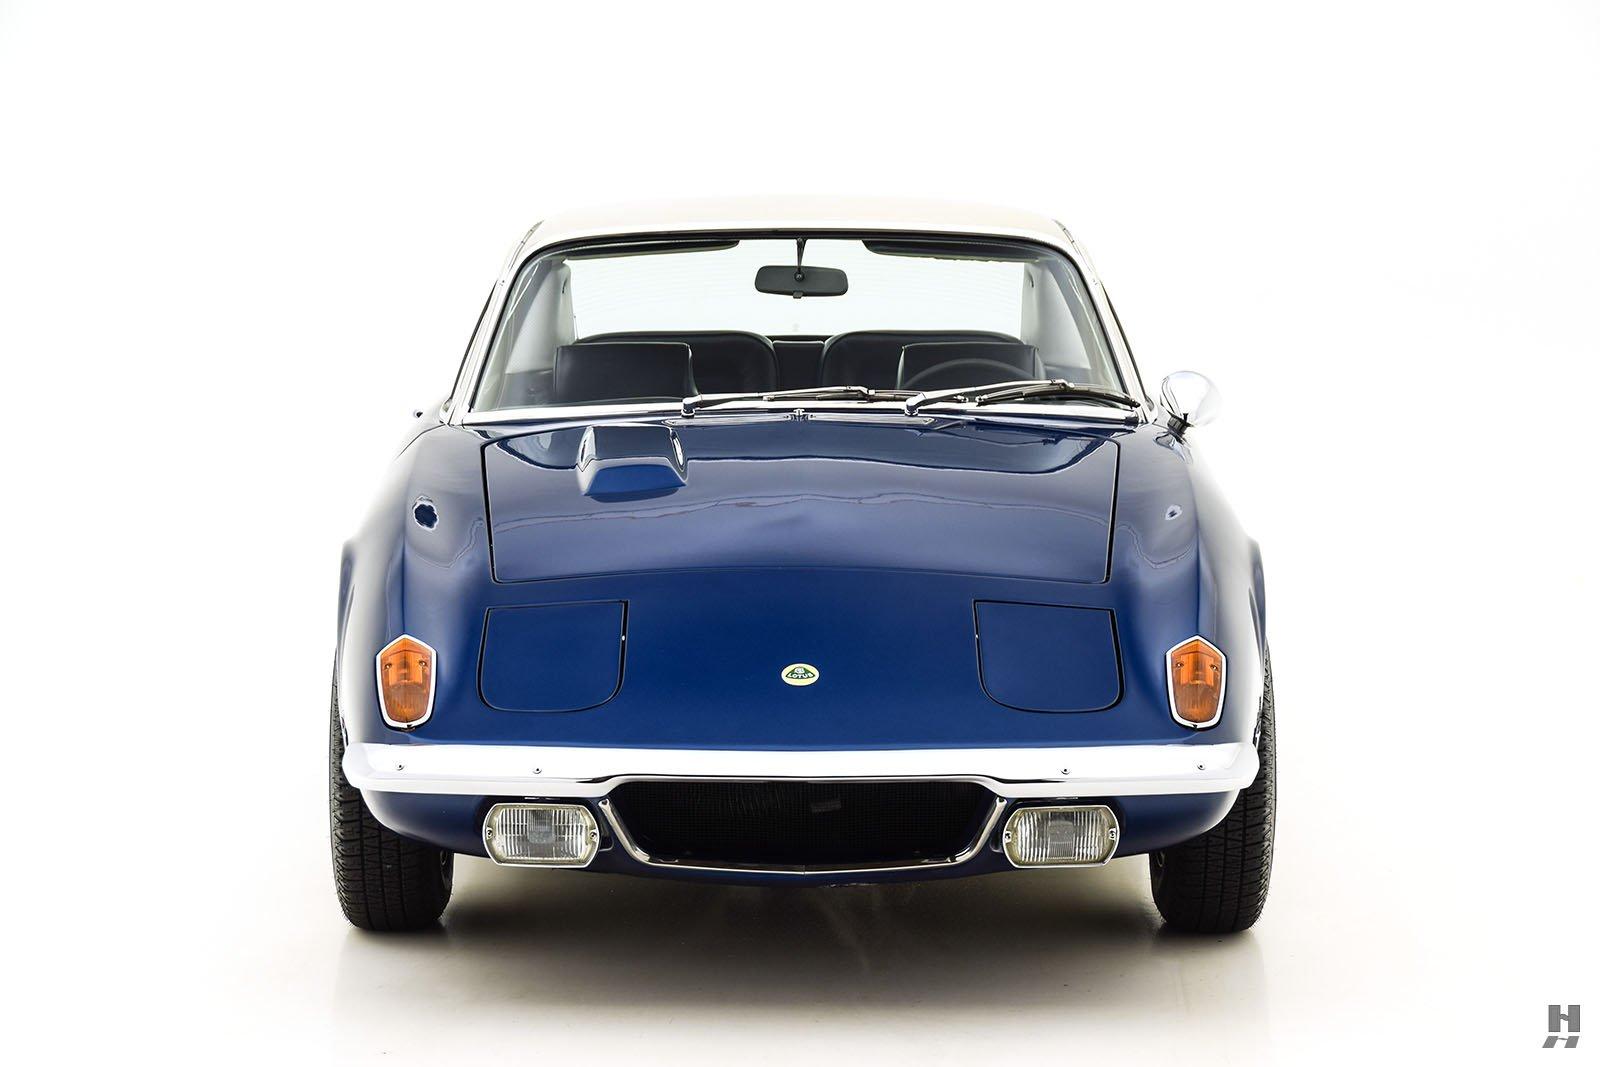 1973 lotus elan 2 s130 coupe for sale buy classic cars hyman ltd. Black Bedroom Furniture Sets. Home Design Ideas